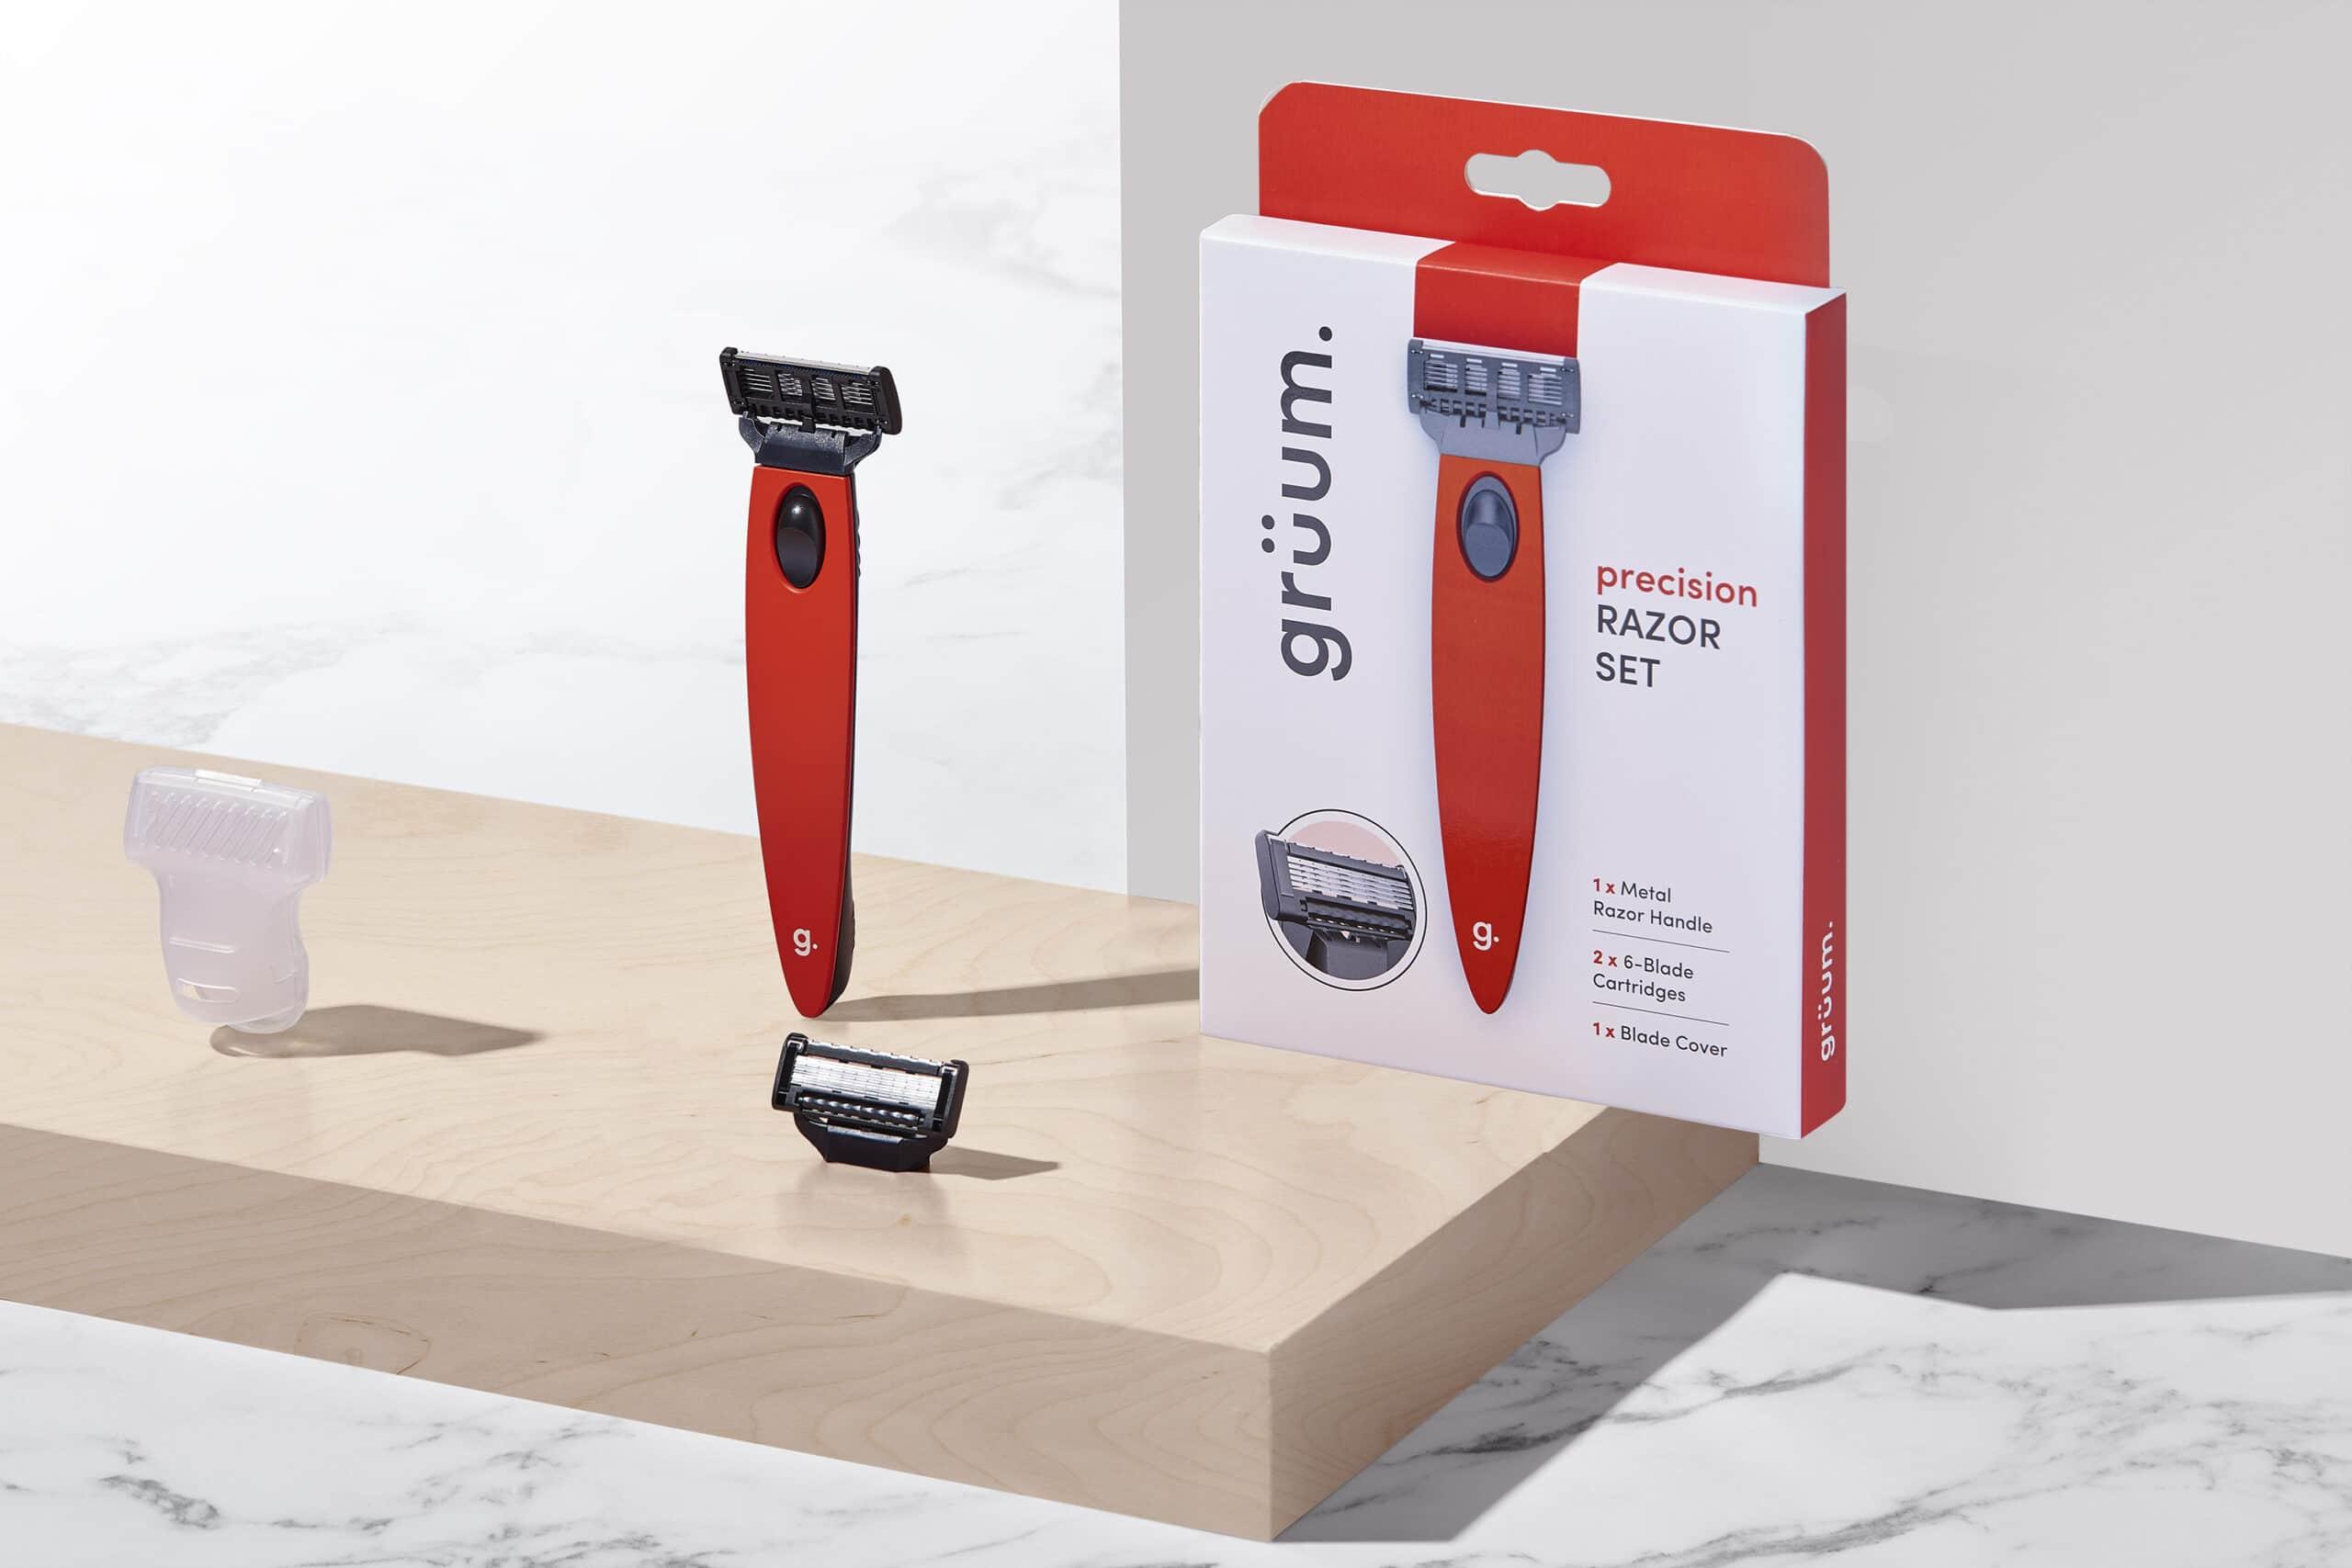 Gruum Razor set product image with razore handle, precision 6 blade cartridge and blade cover